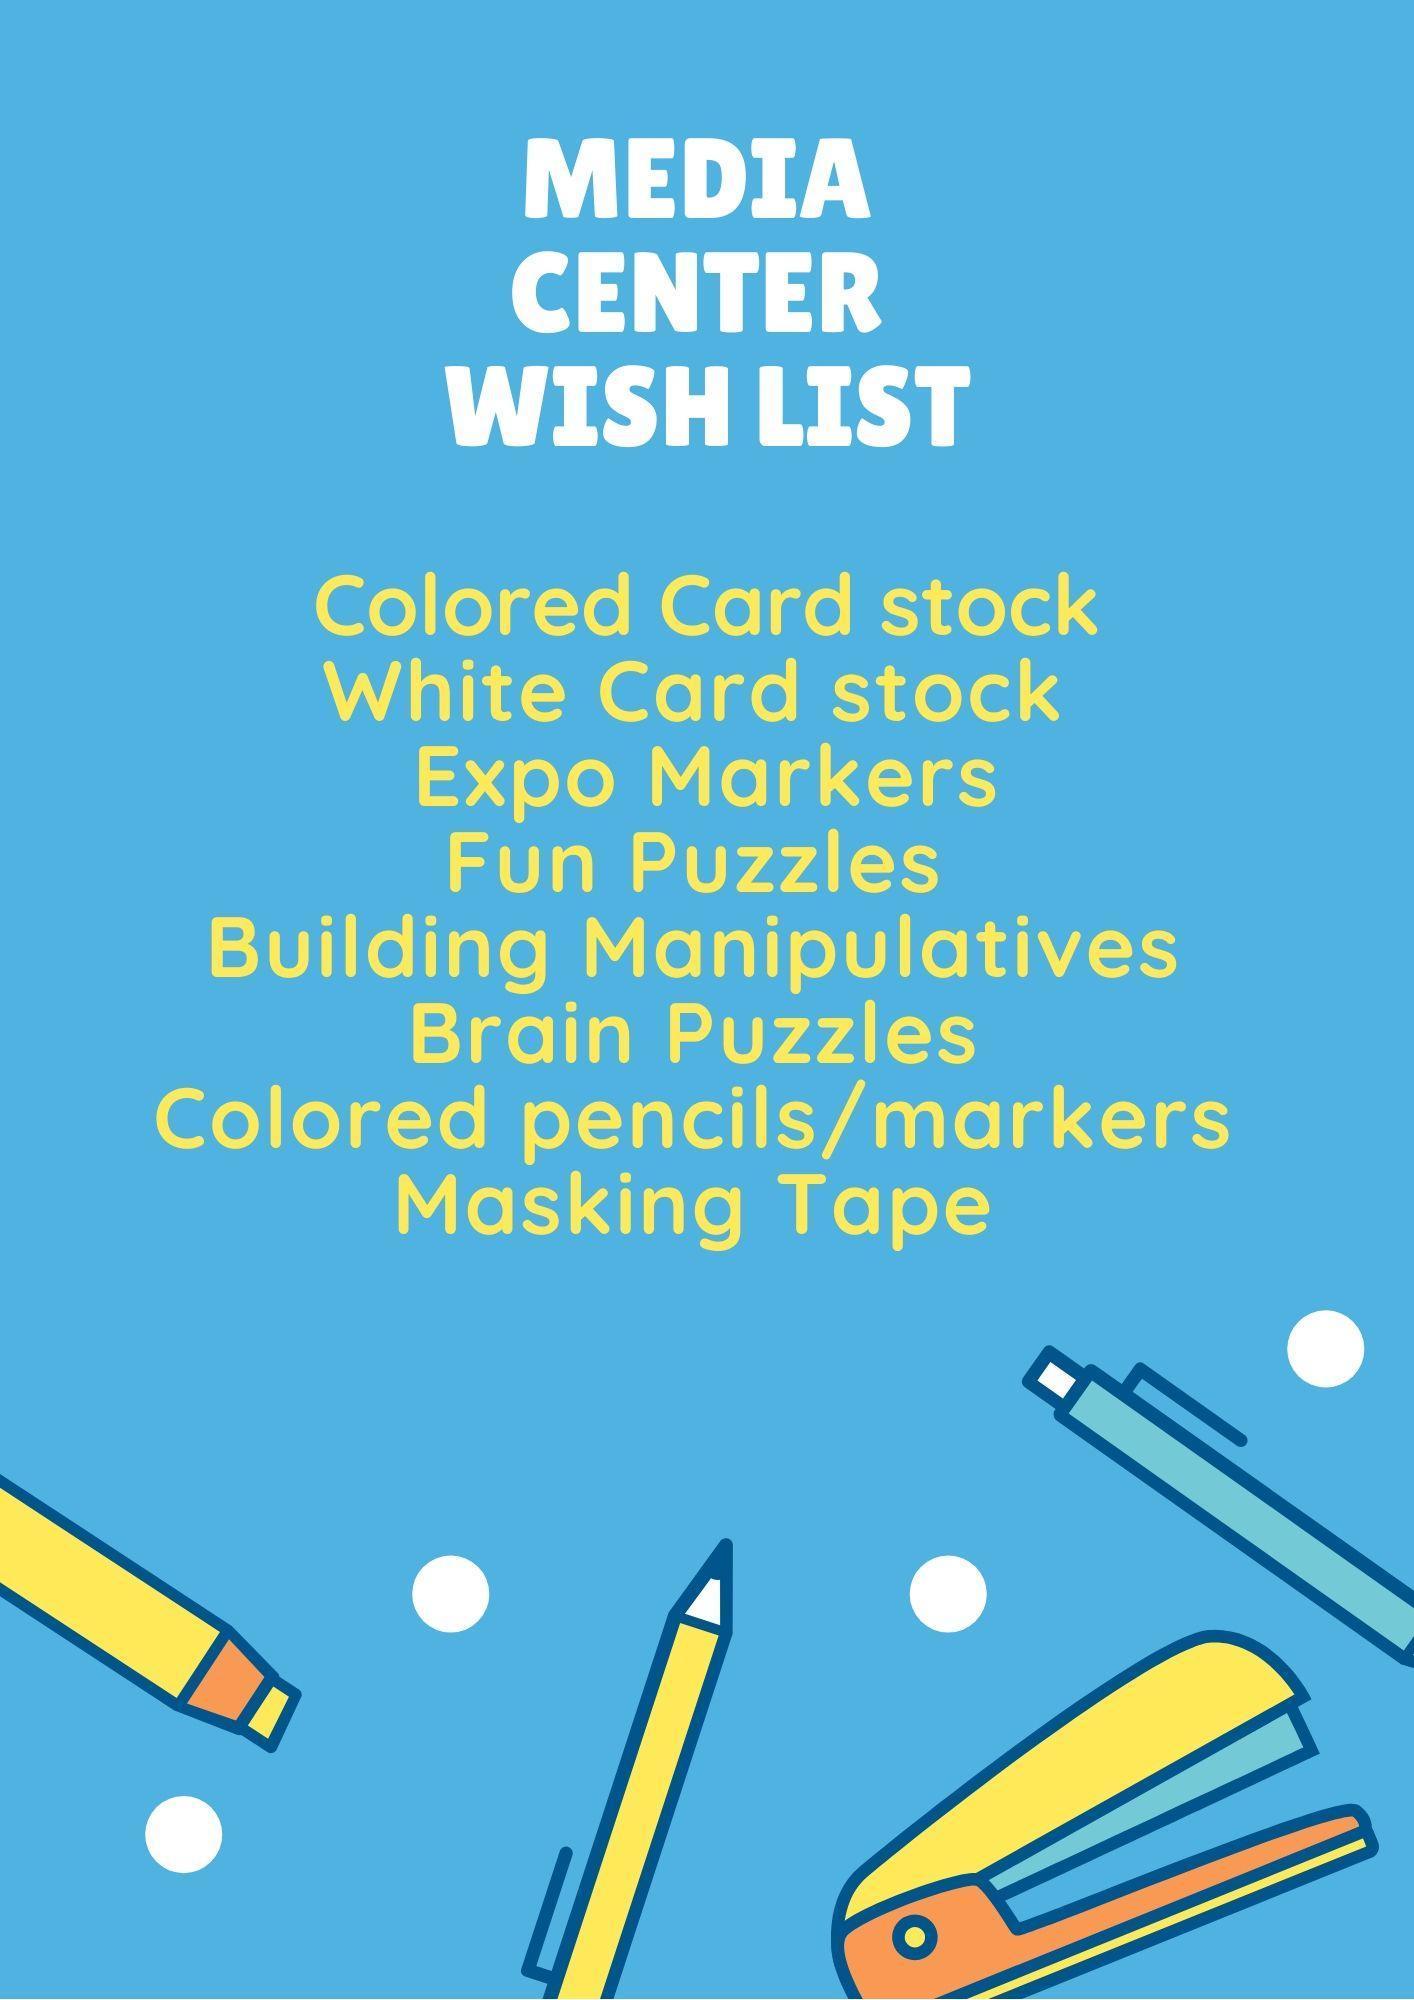 Media Center Wish list